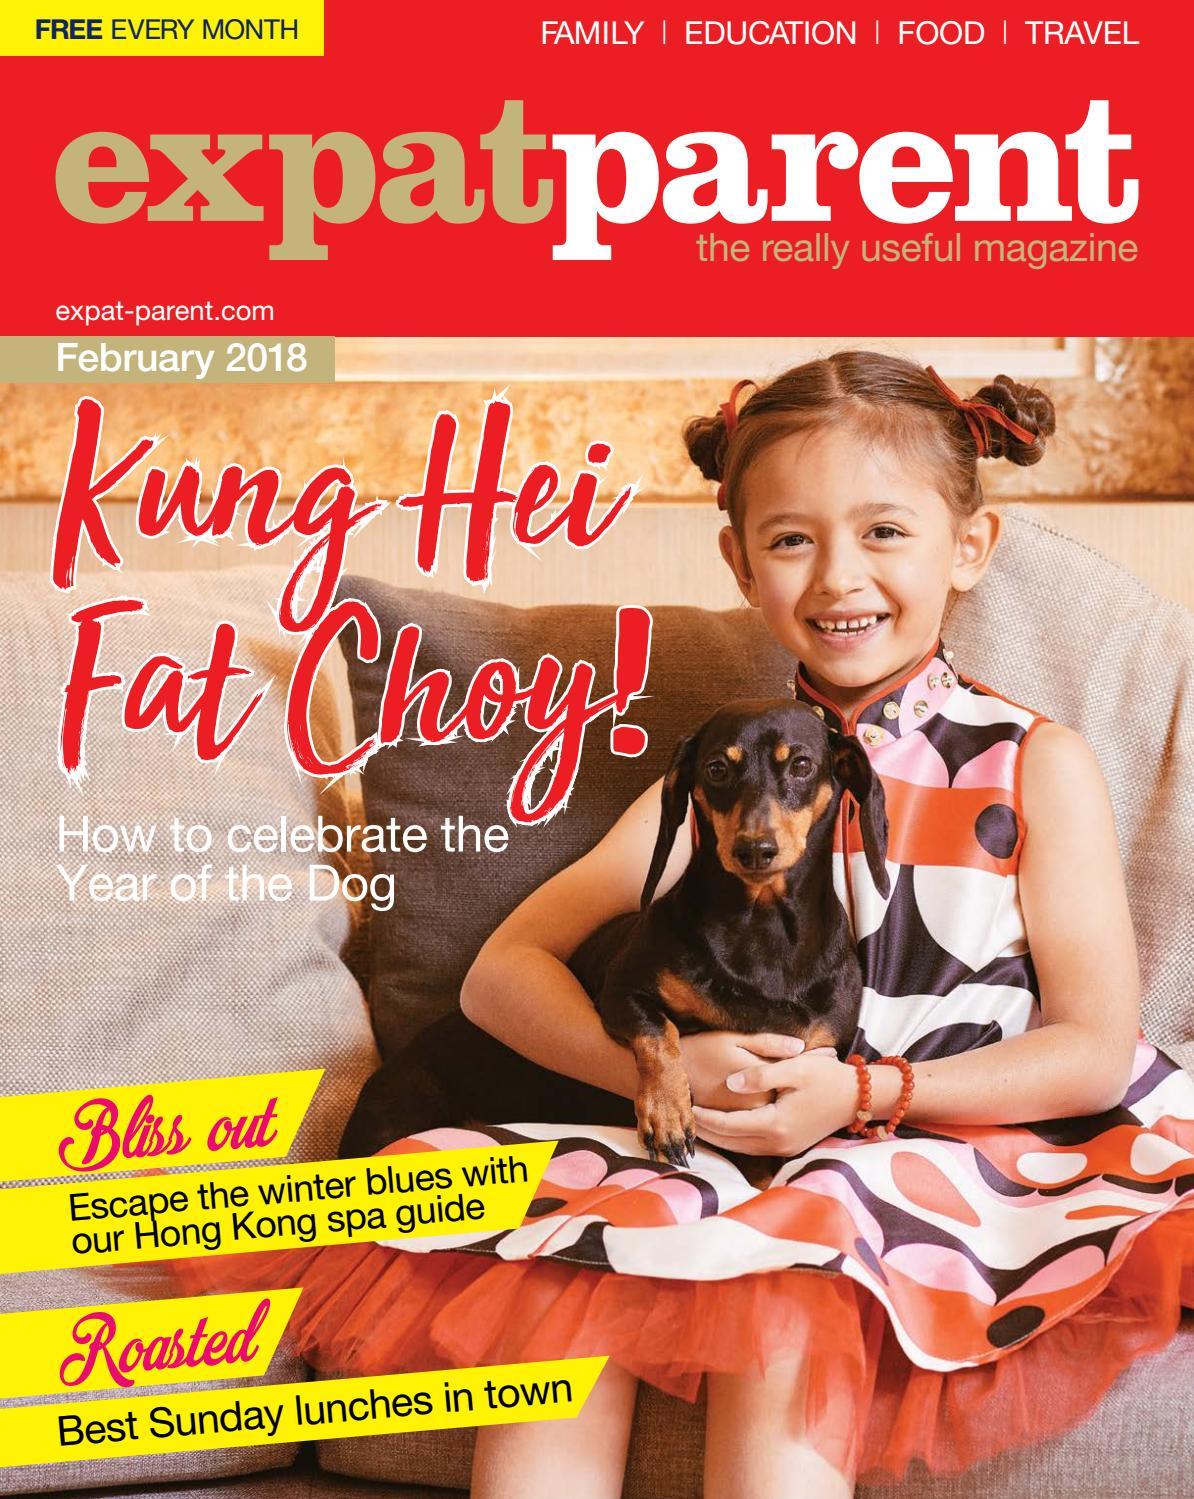 2c642b20 Expat Parent Feb 2018 by Hong Kong Living Ltd - issuu